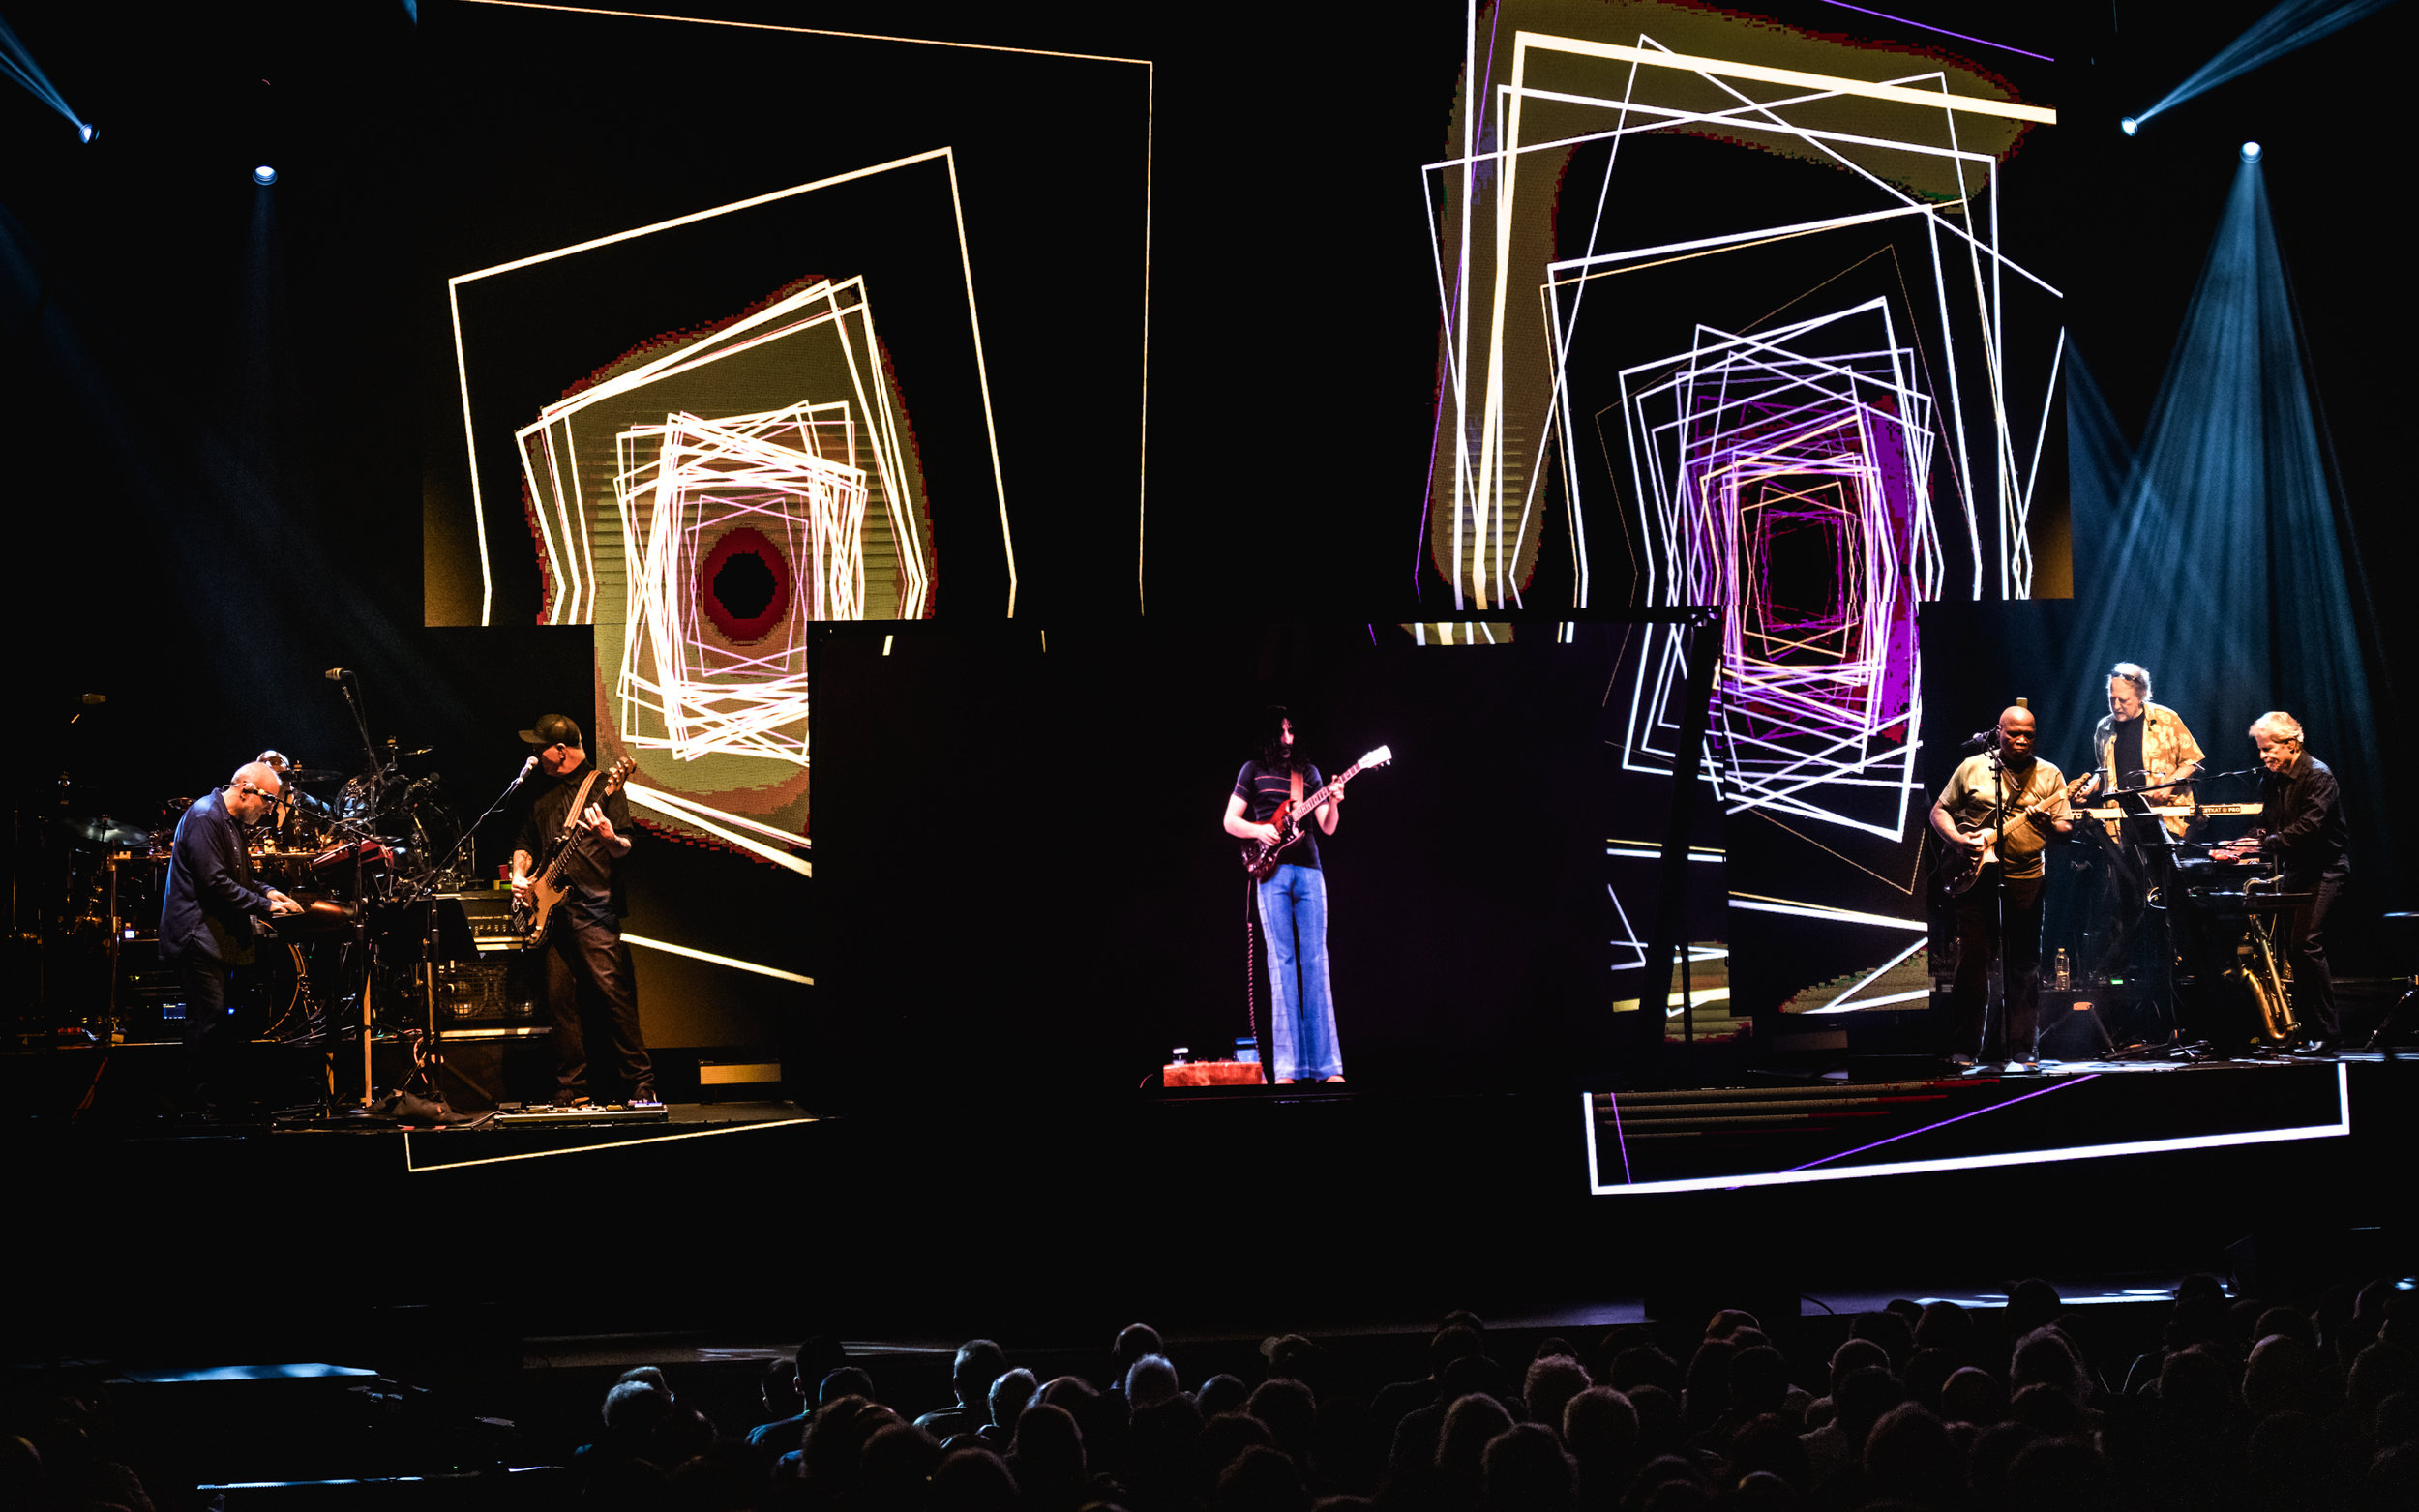 Frank Zappa Hologram Tour-11.jpg